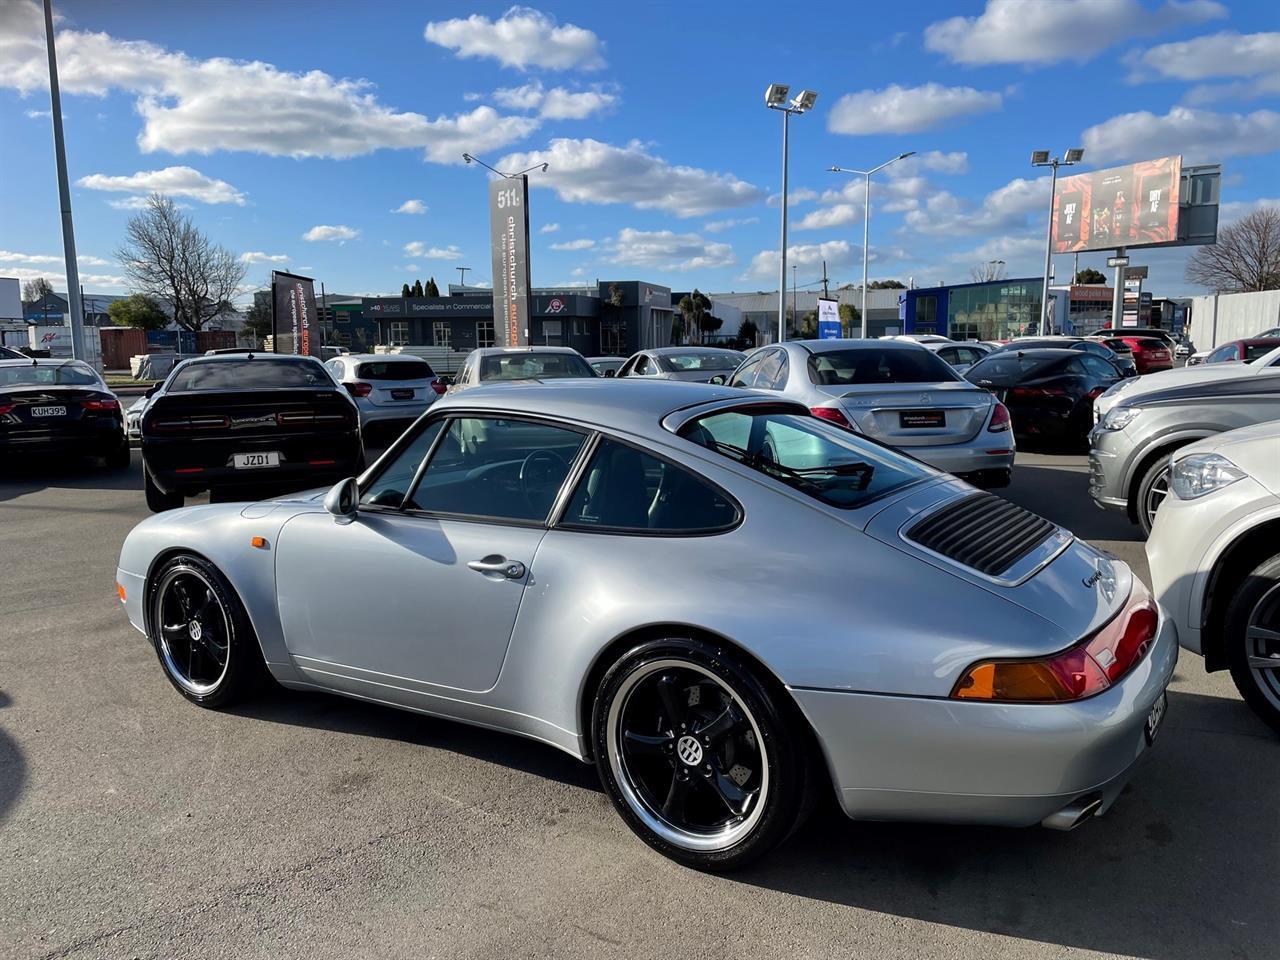 image-2, 1996 Porsche 911 993 Carrera 2 at Christchurch